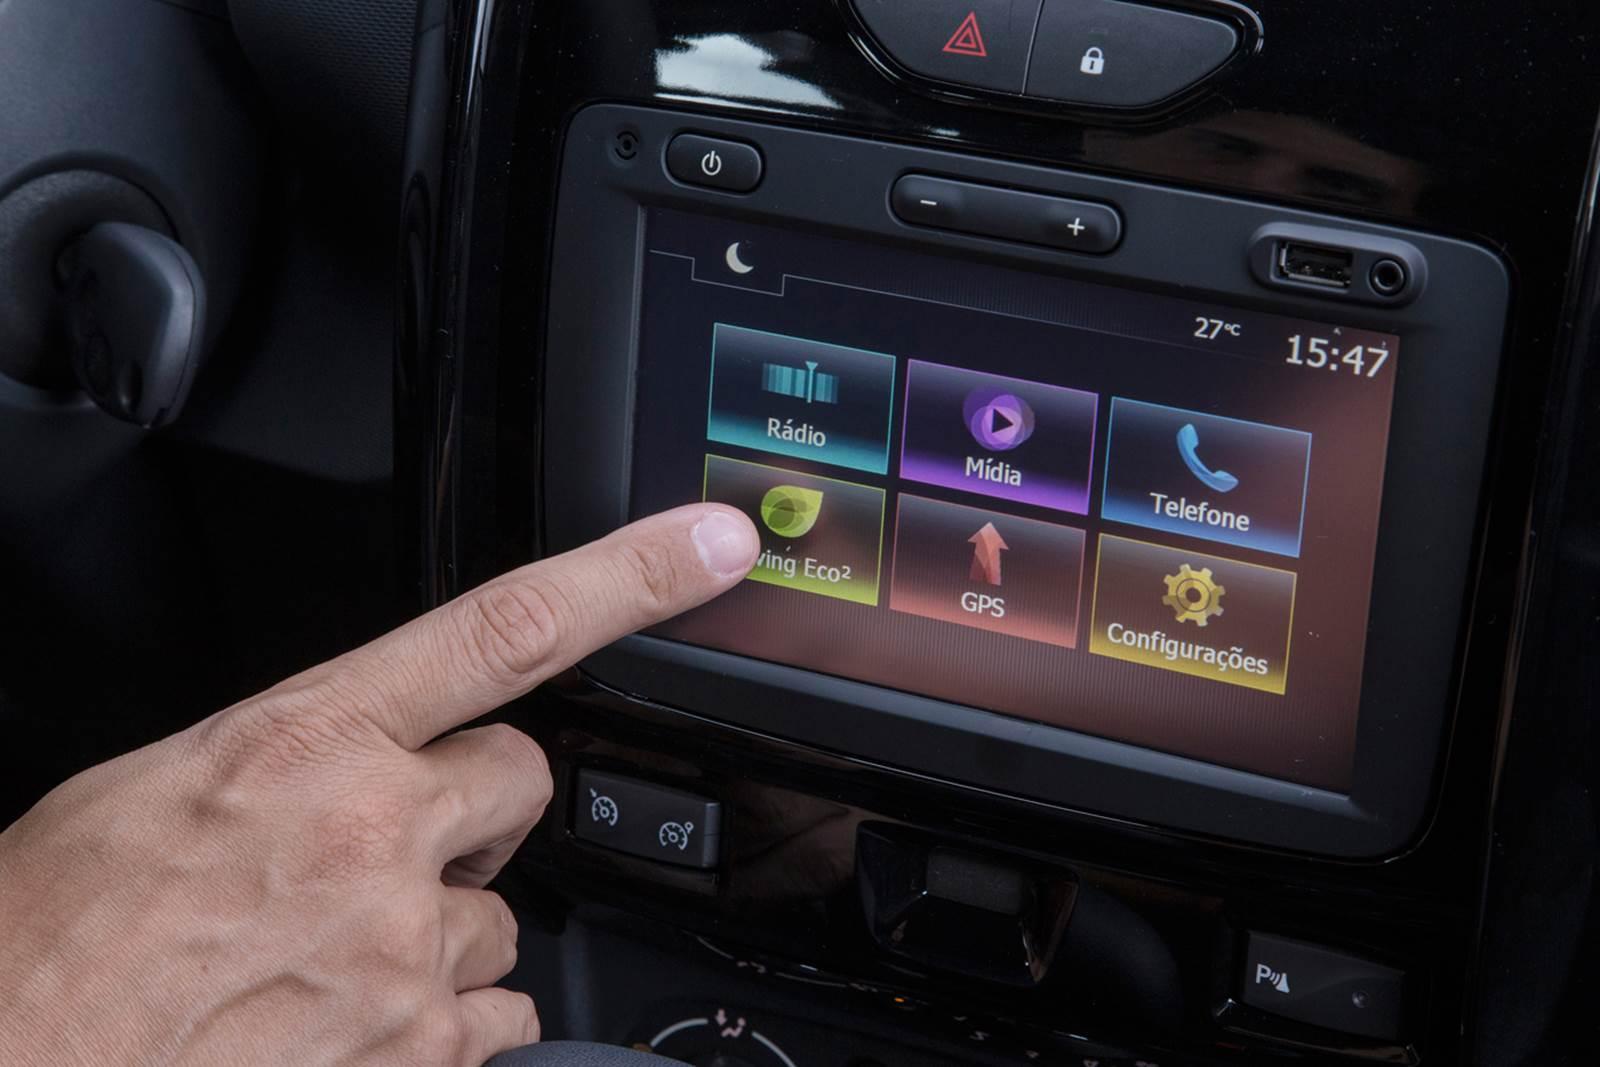 Novo Renault Duster 2016 - sistema multimídia